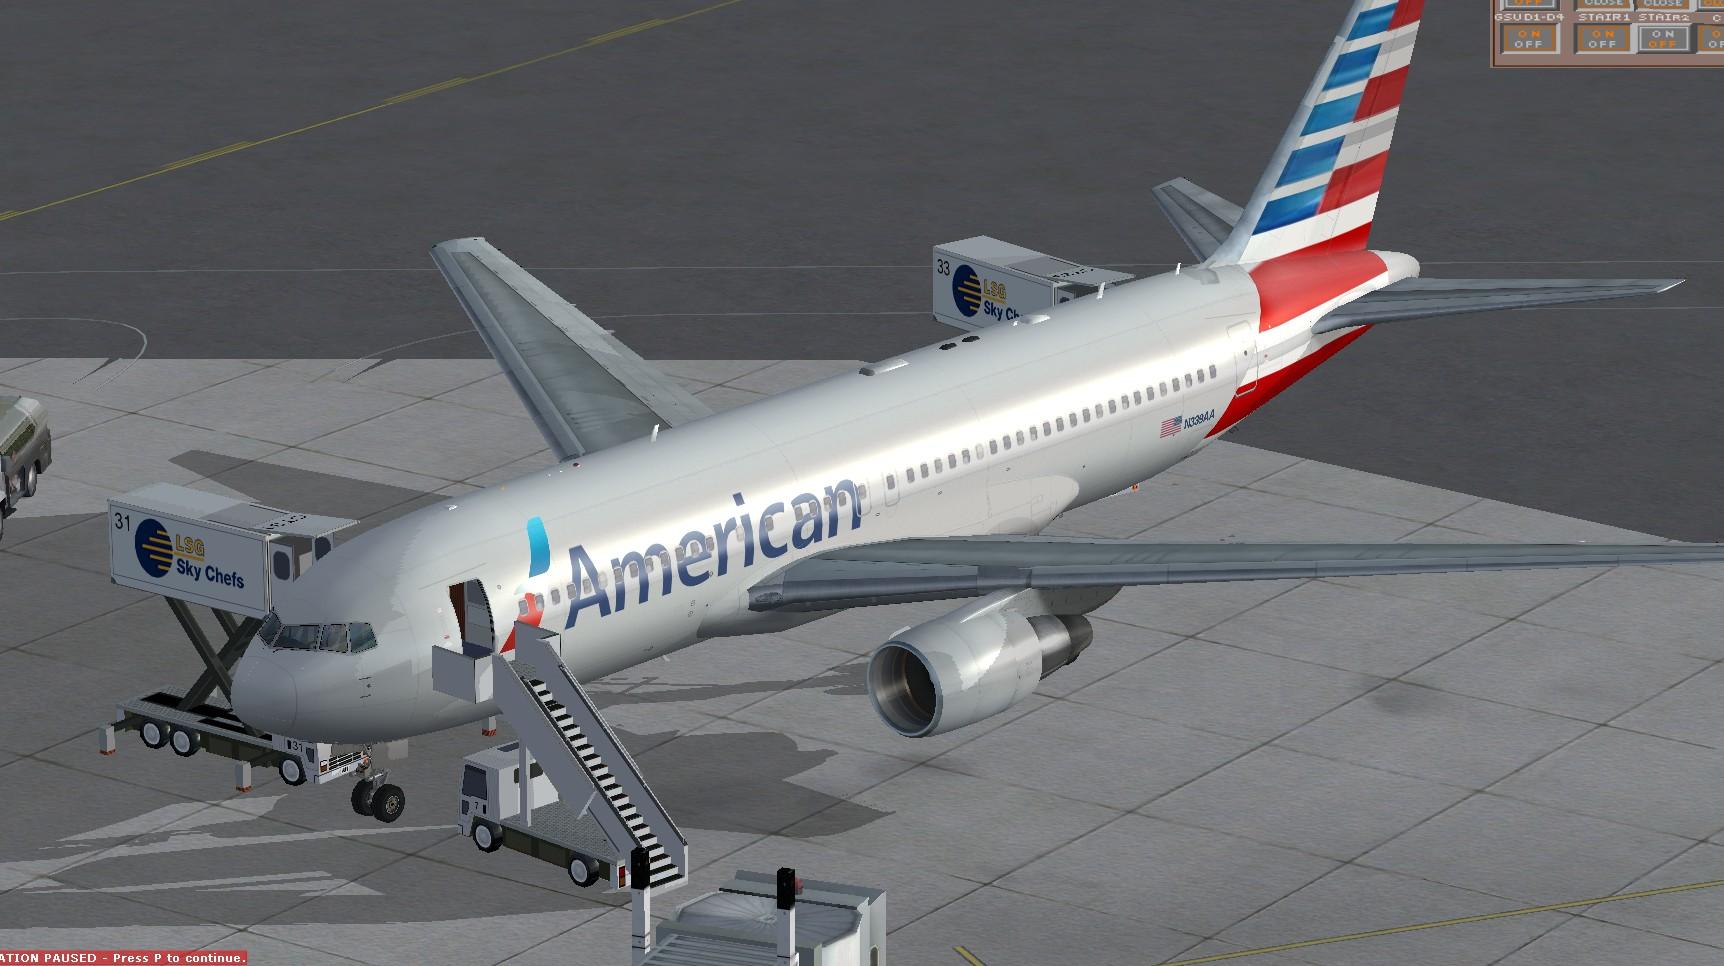 fs-freeware net - FSX Boeing 767-200ER American Airlines new